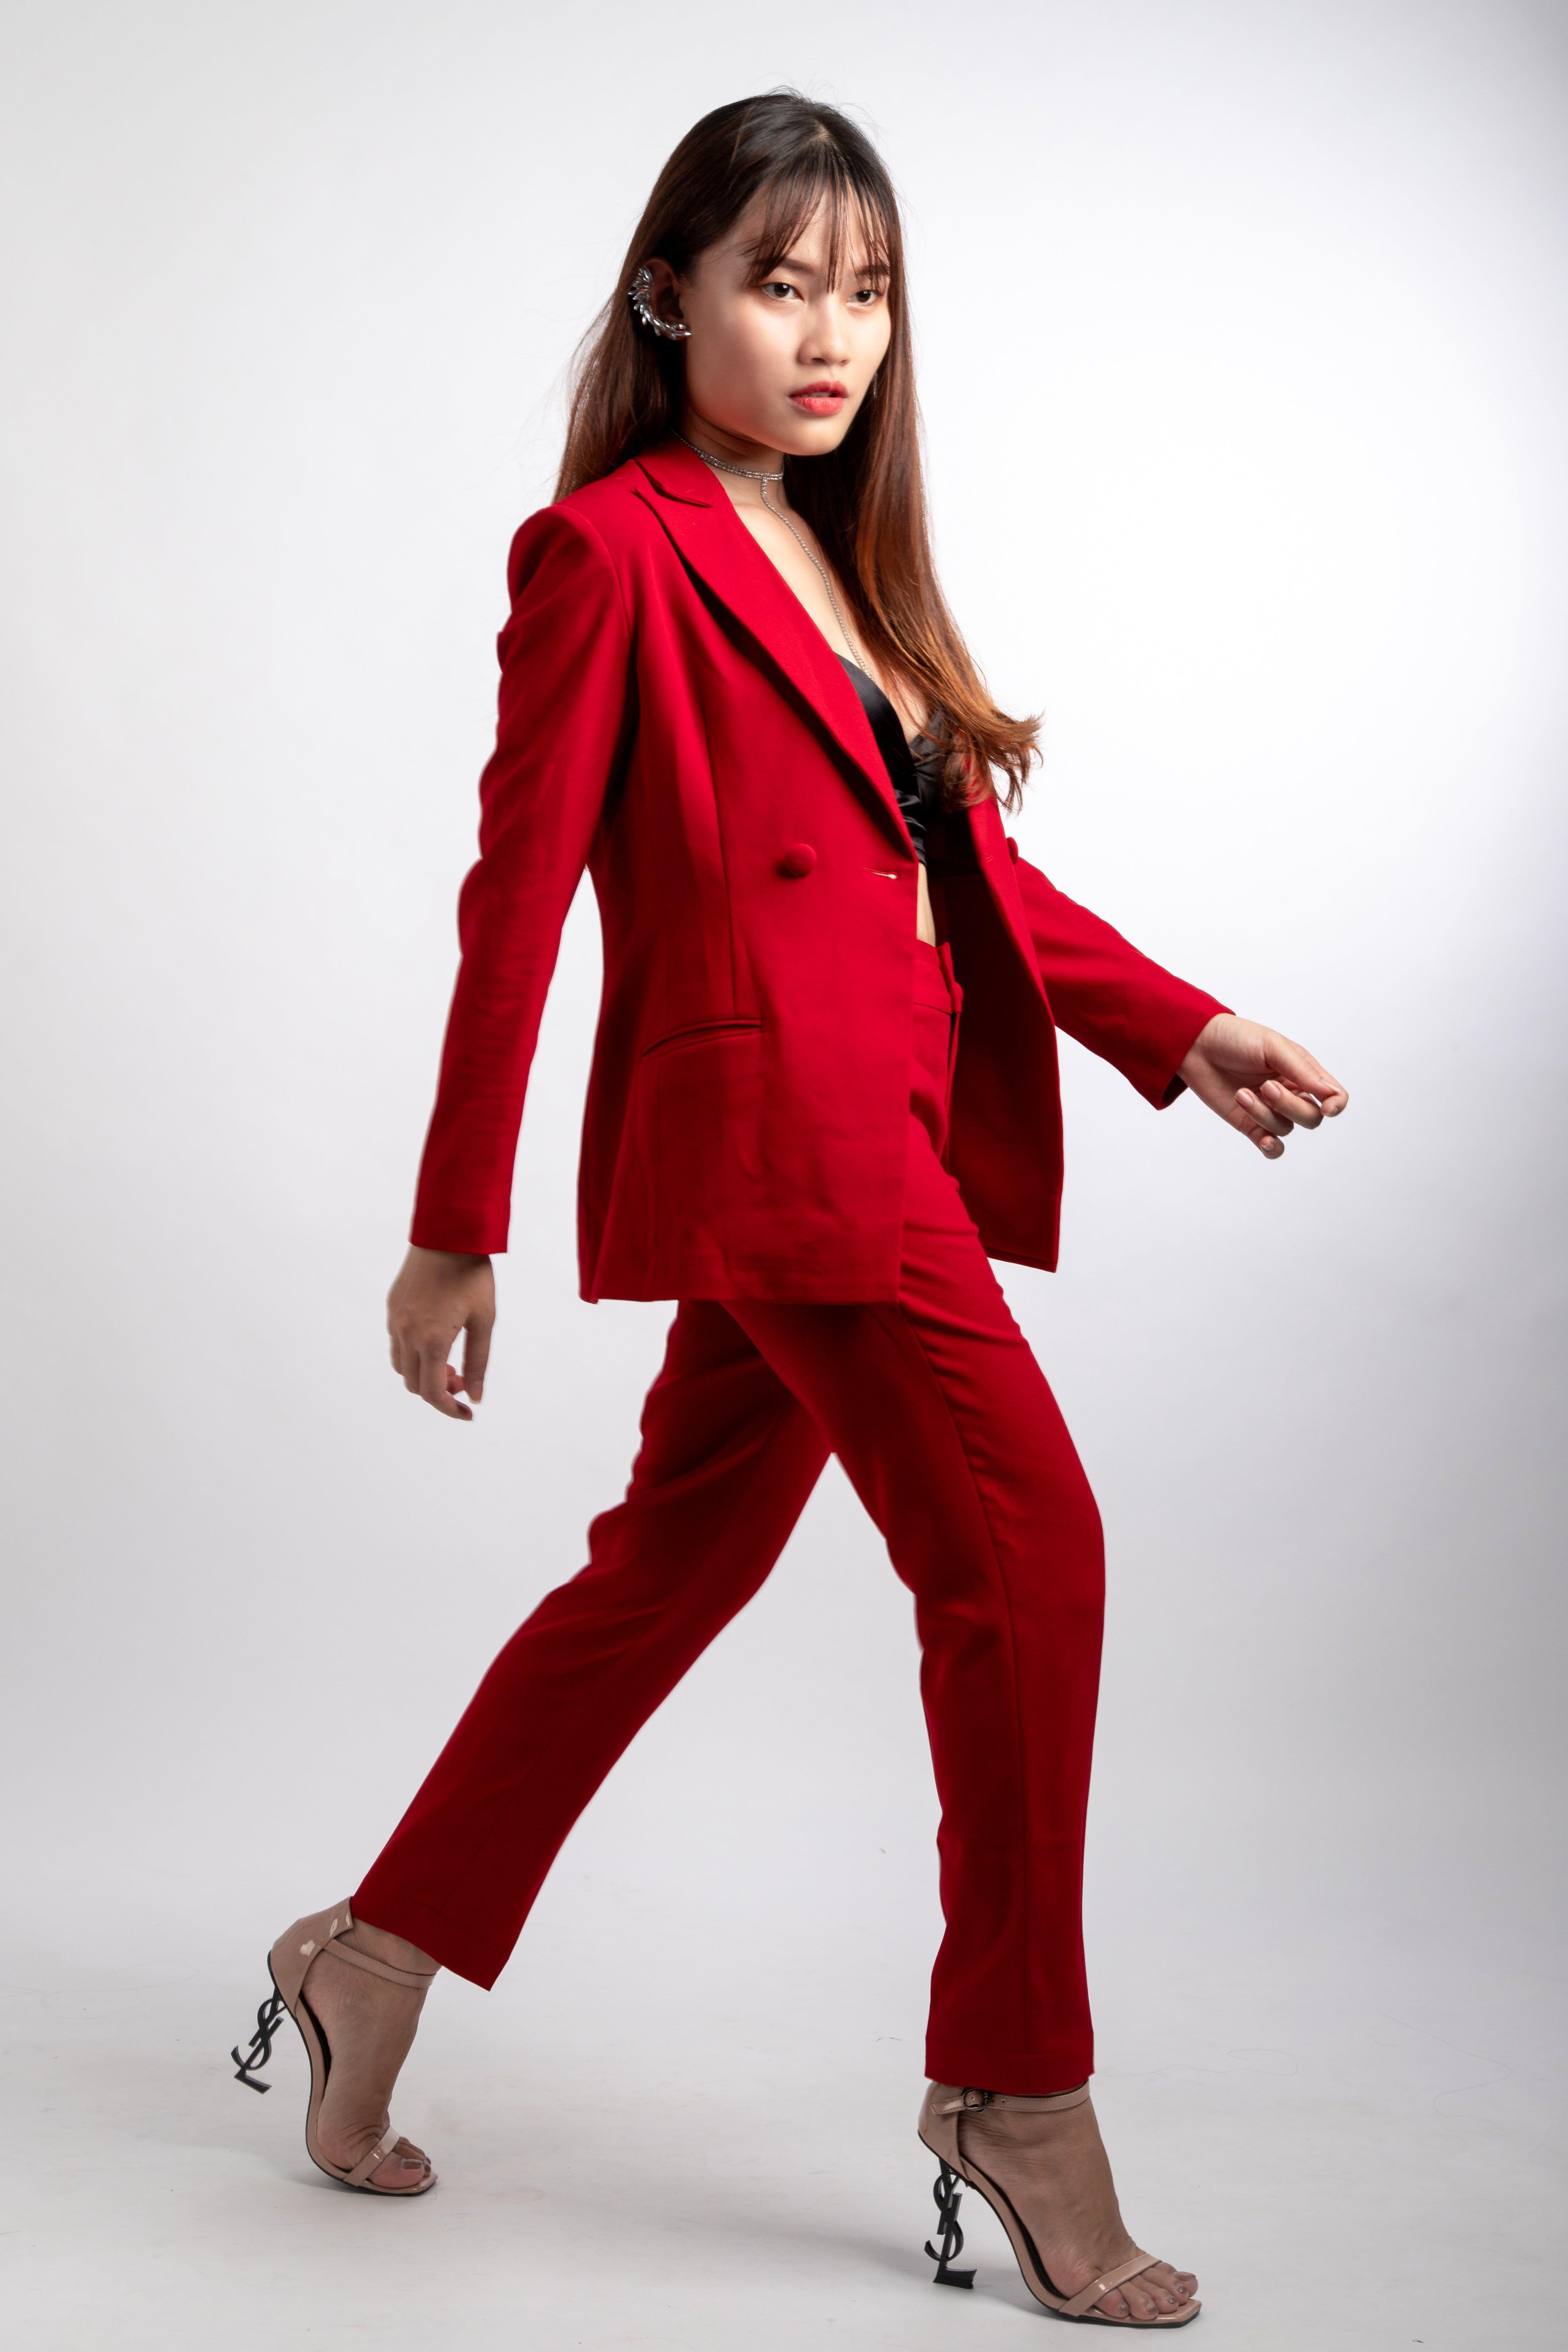 Woman Wearing Red Blazer and Dress Pants